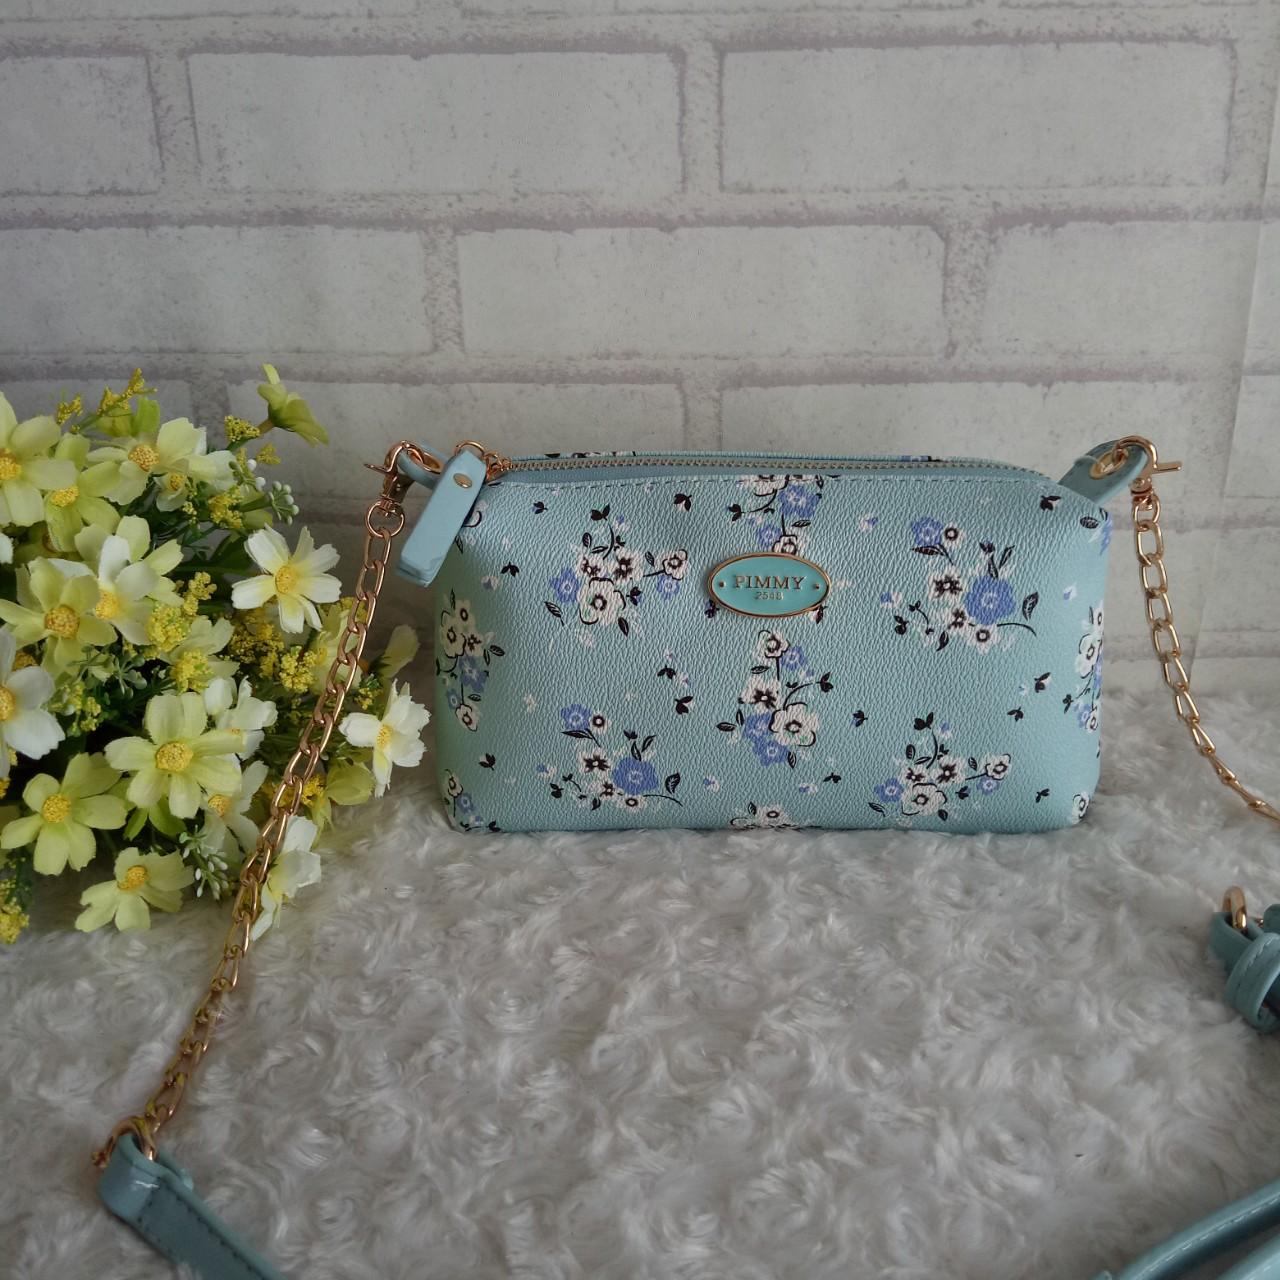 FS0977-กระเป๋าพิมมี่ลายดอก ไซส์มินิ ขนาด 1.5*8*4.5 นิ้ิ้ว งานน่ารัก ด้านใน 1 ช่อง มีช่องใส่ของด้านใน สายยาวปรับได้